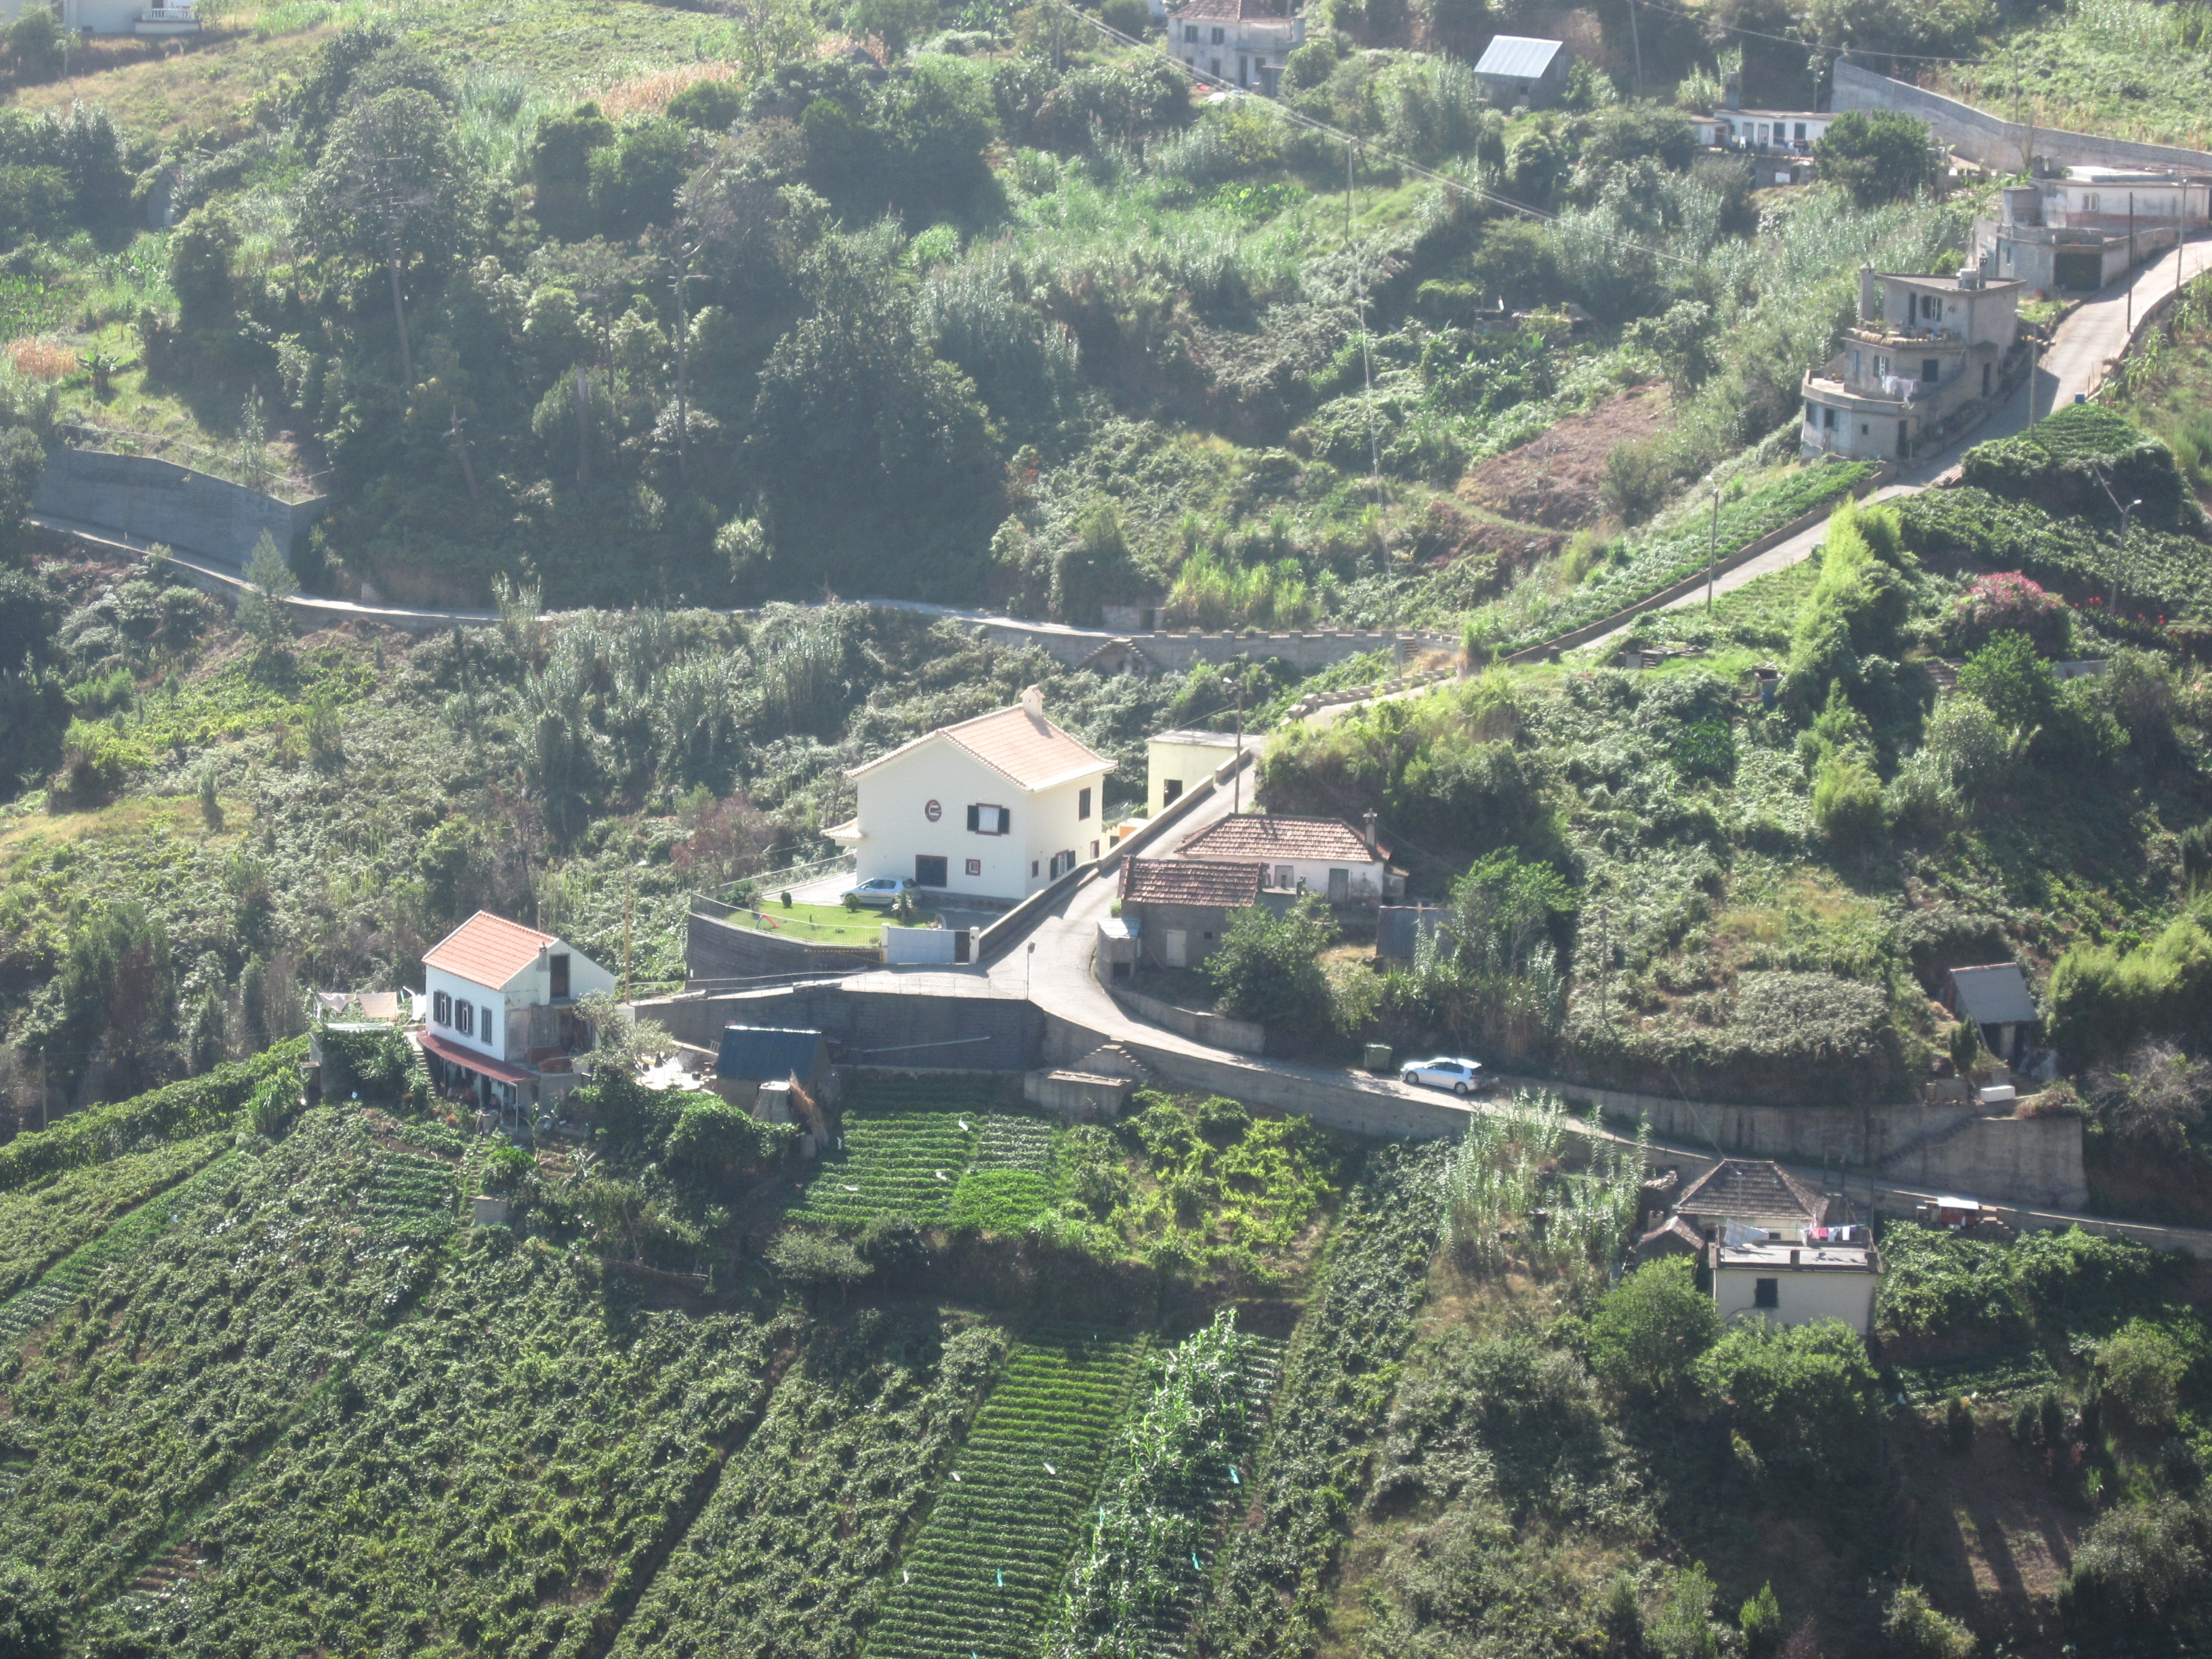 Madeira farming landscape